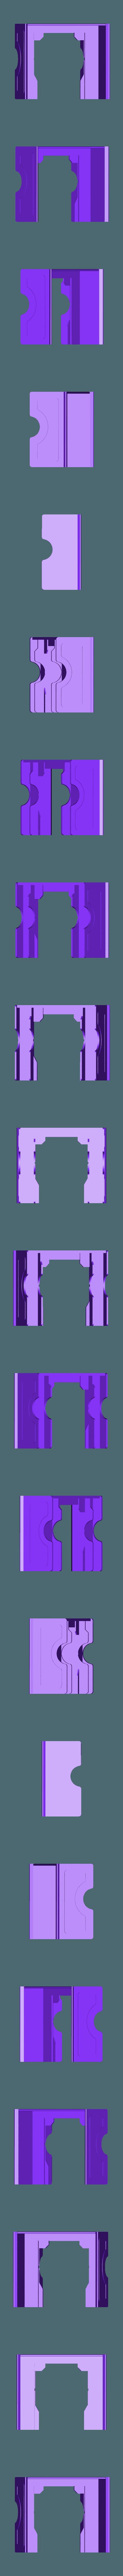 73TRK_tray_timber.stl Download STL file Ratrod Pickup • 3D printing template, macone1